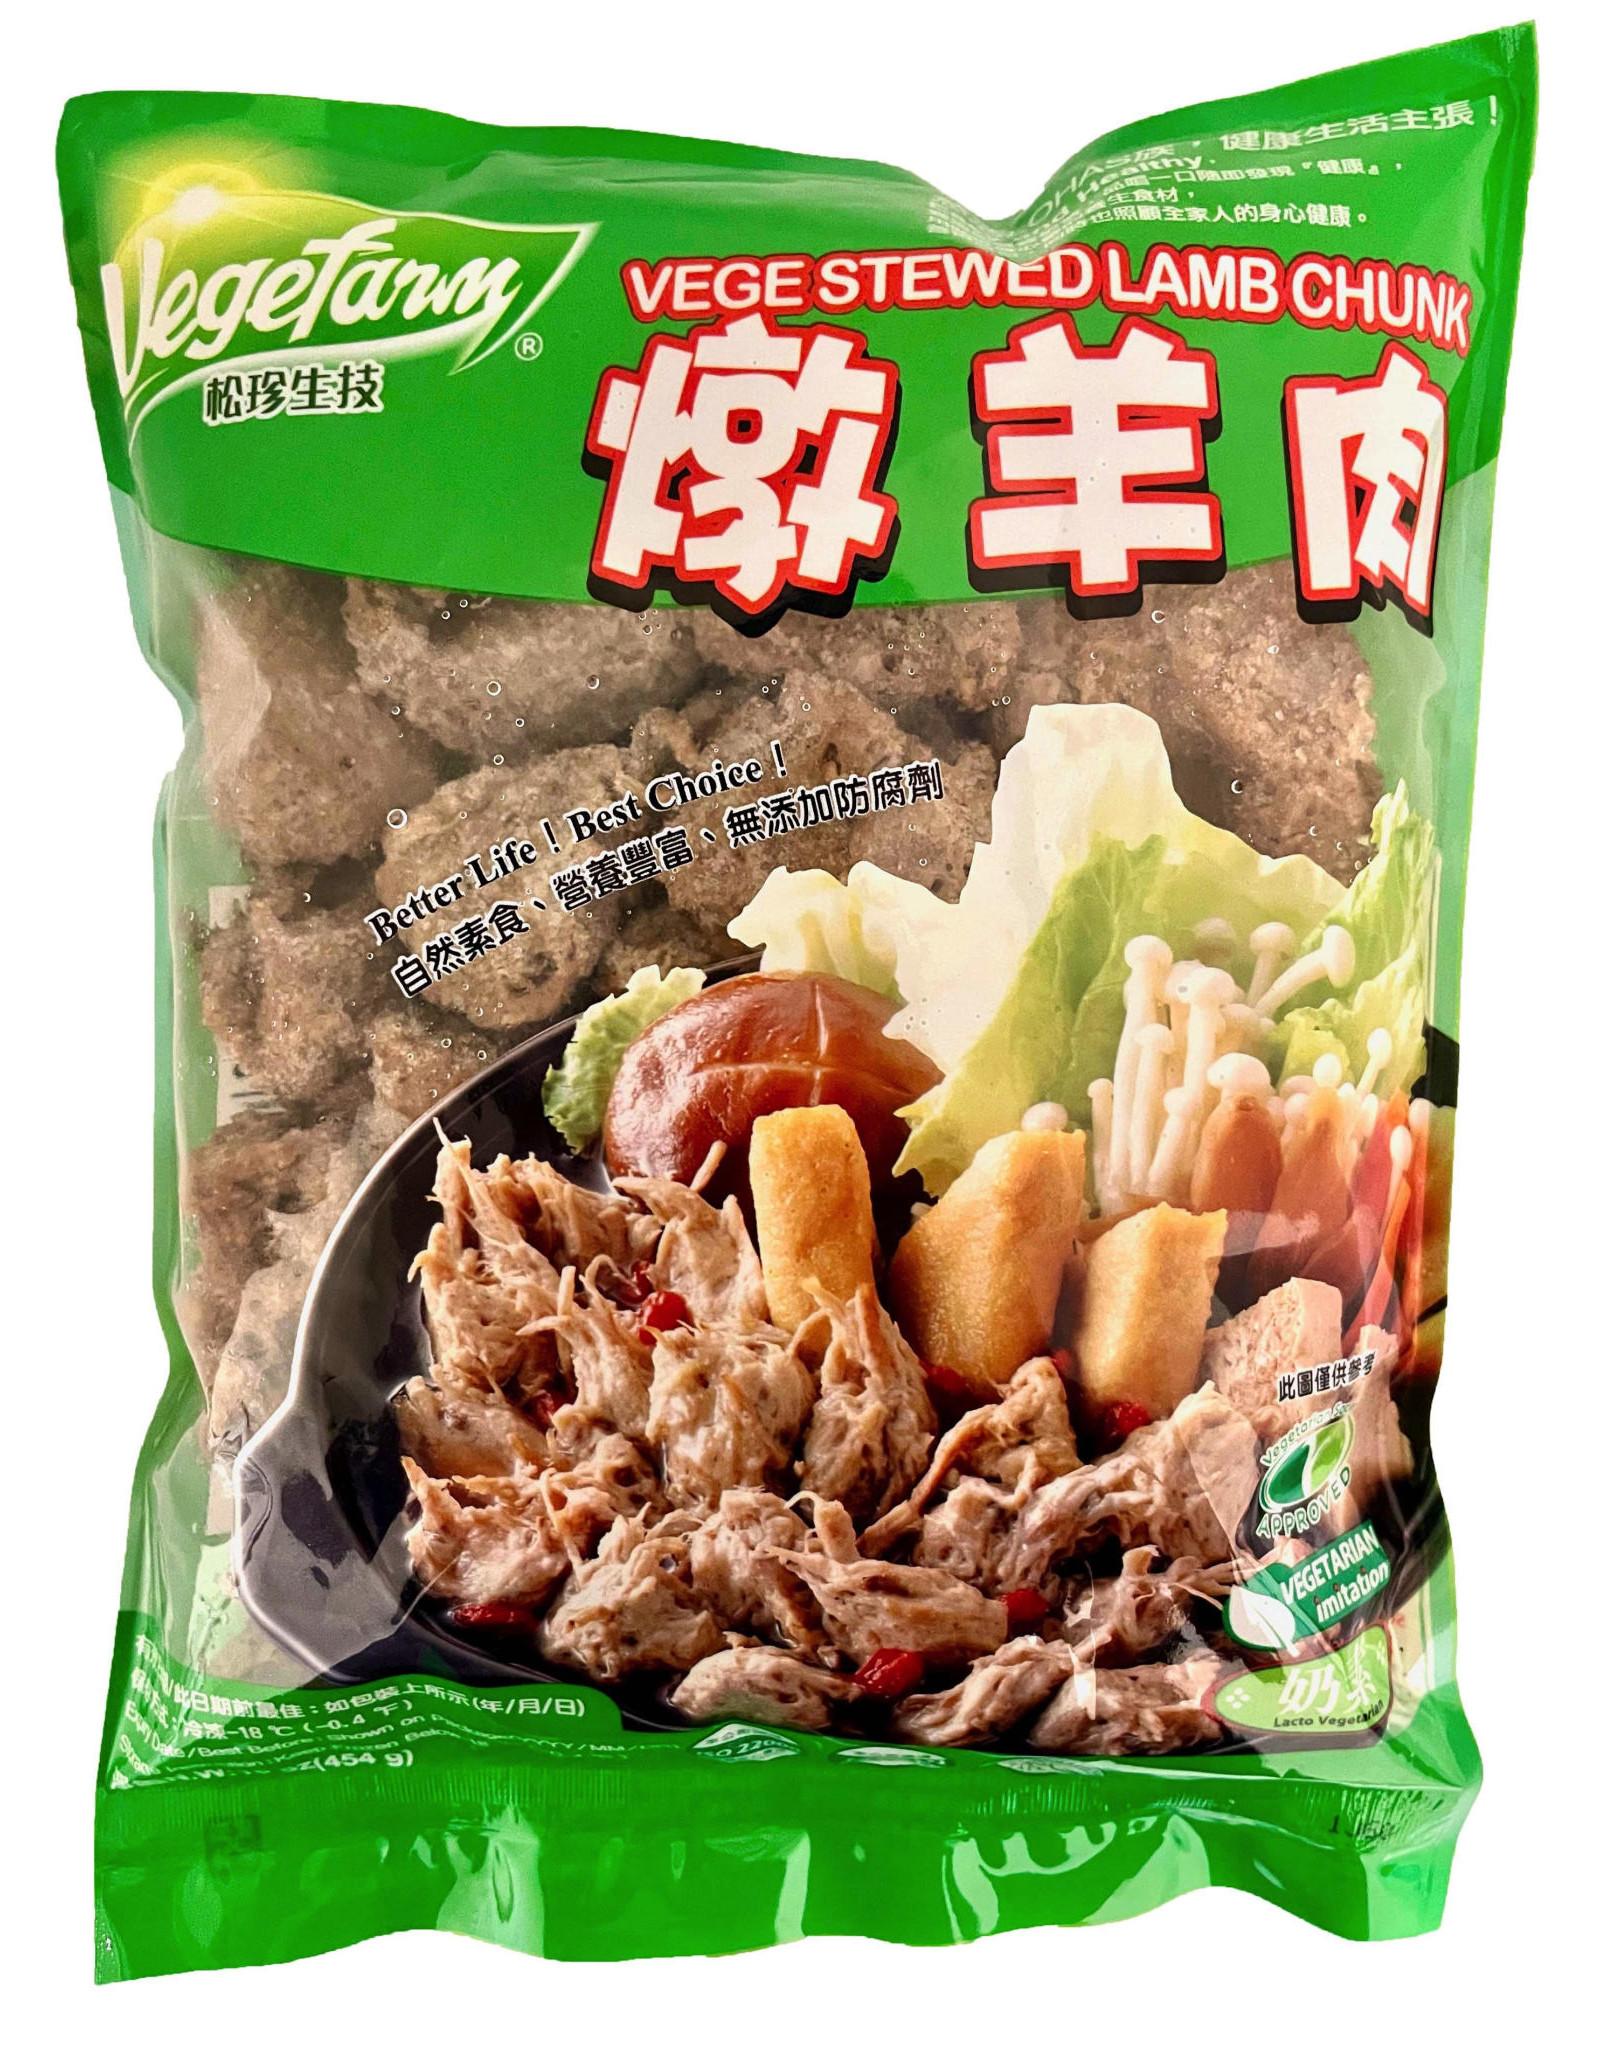 Vegefarm * 松珍 (VF) Vege Stewed Lamb Chunk (S)*(松珍) 素燉羊肉 (S)